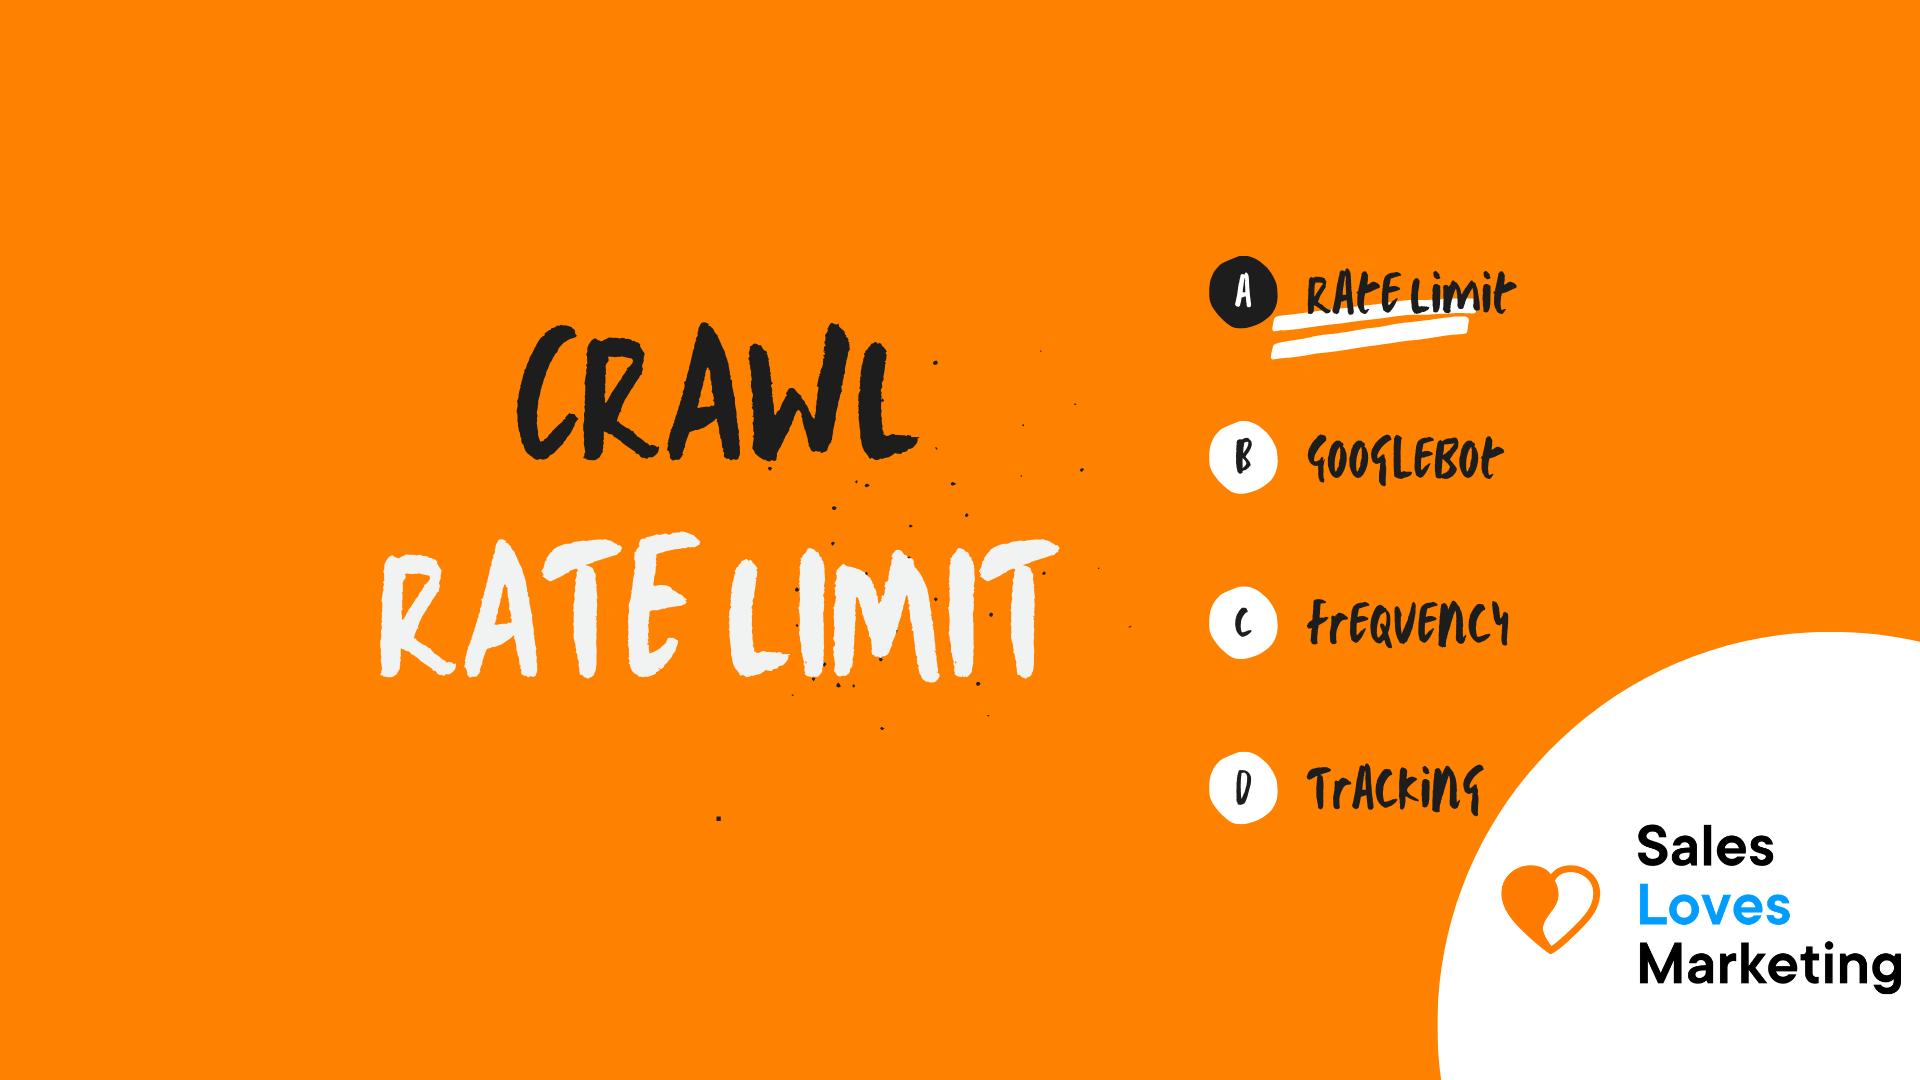 Crawl Rate Limit